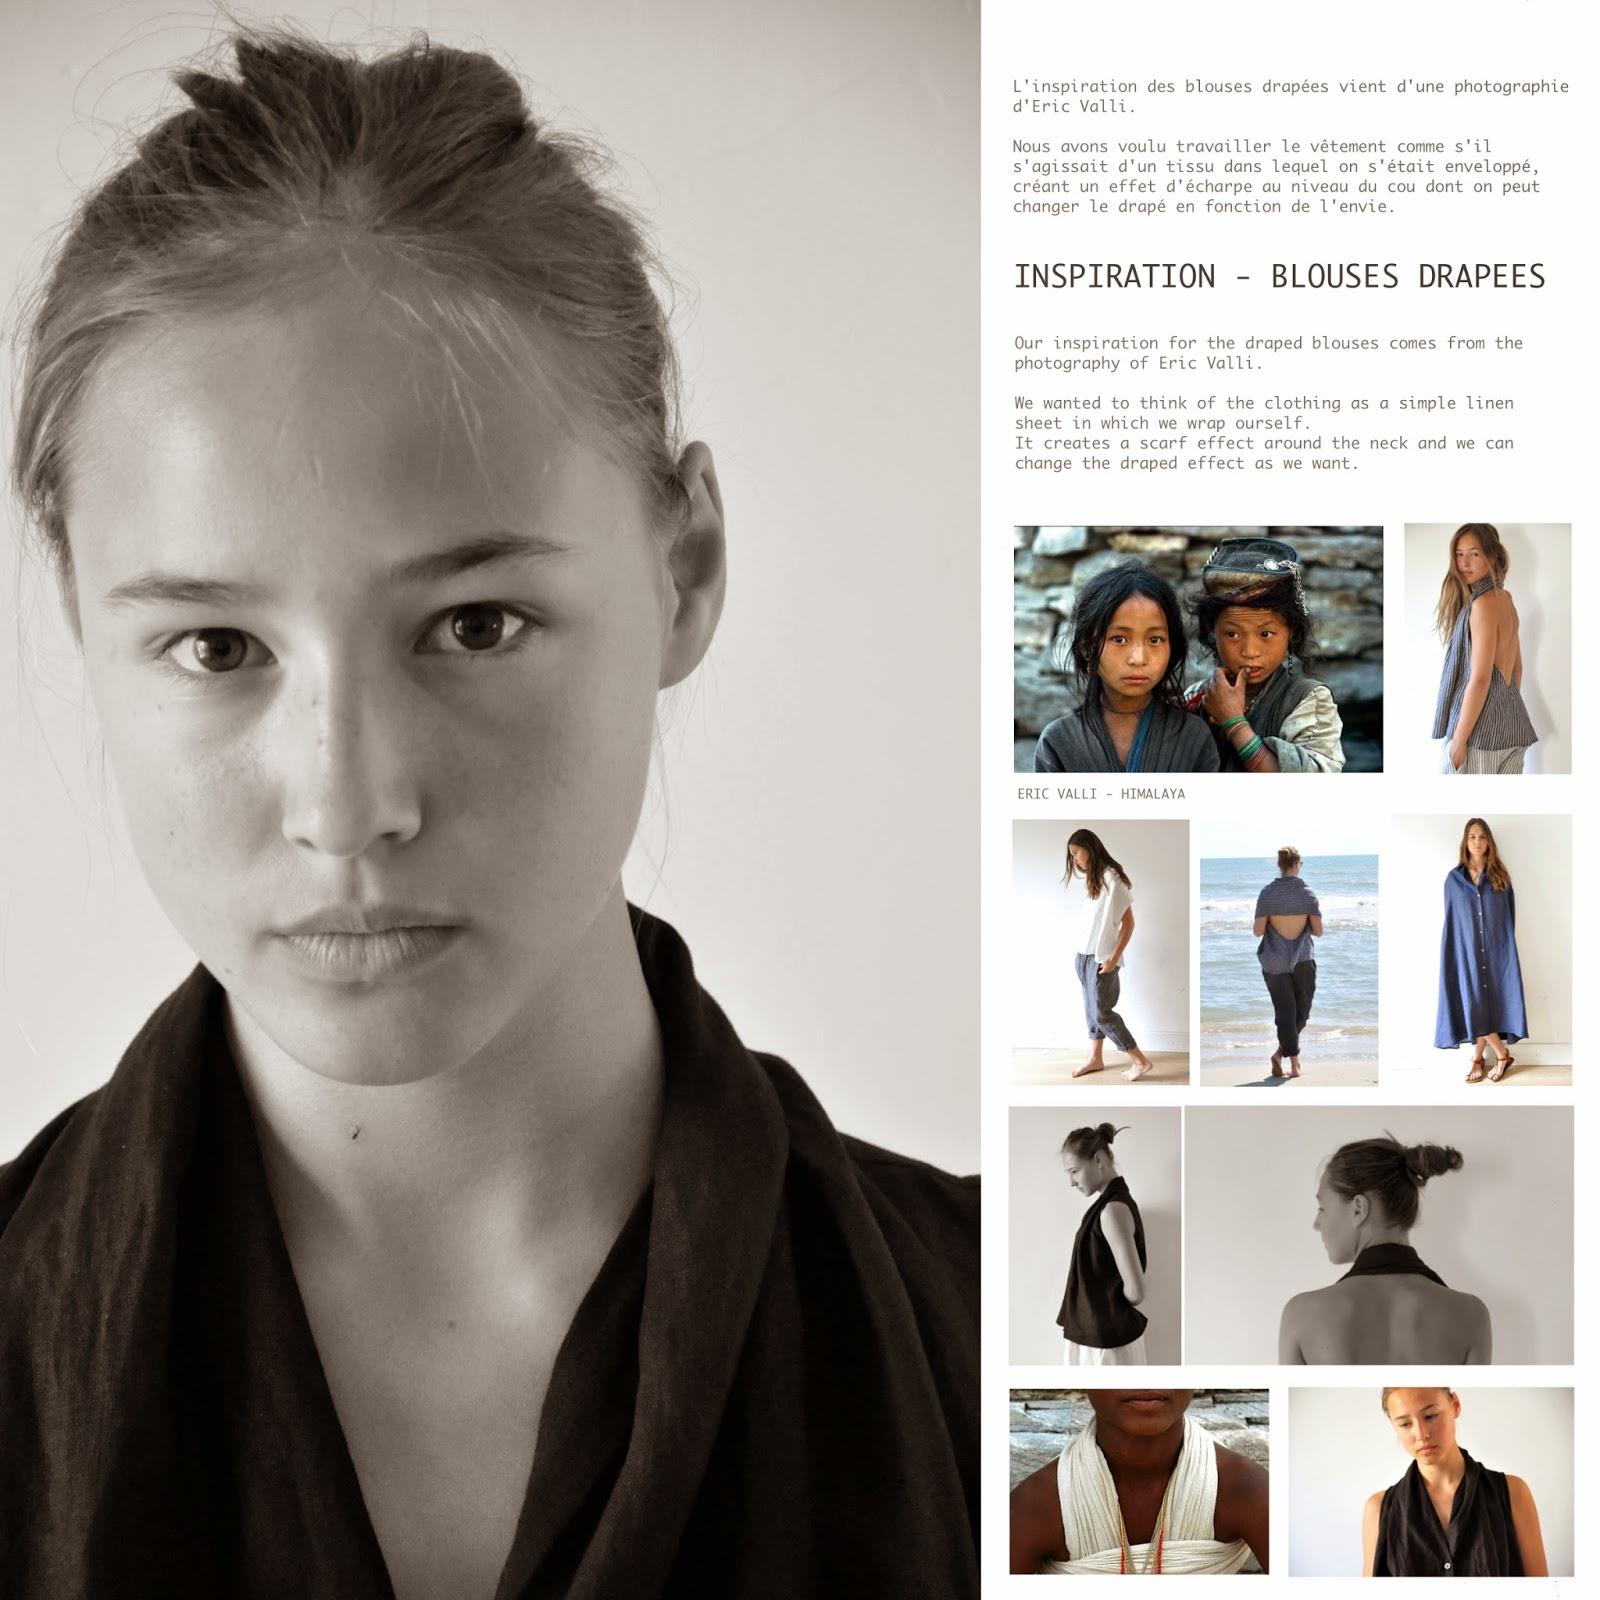 http://www.vdj-boutique.com/vdj/1141--blouses.php